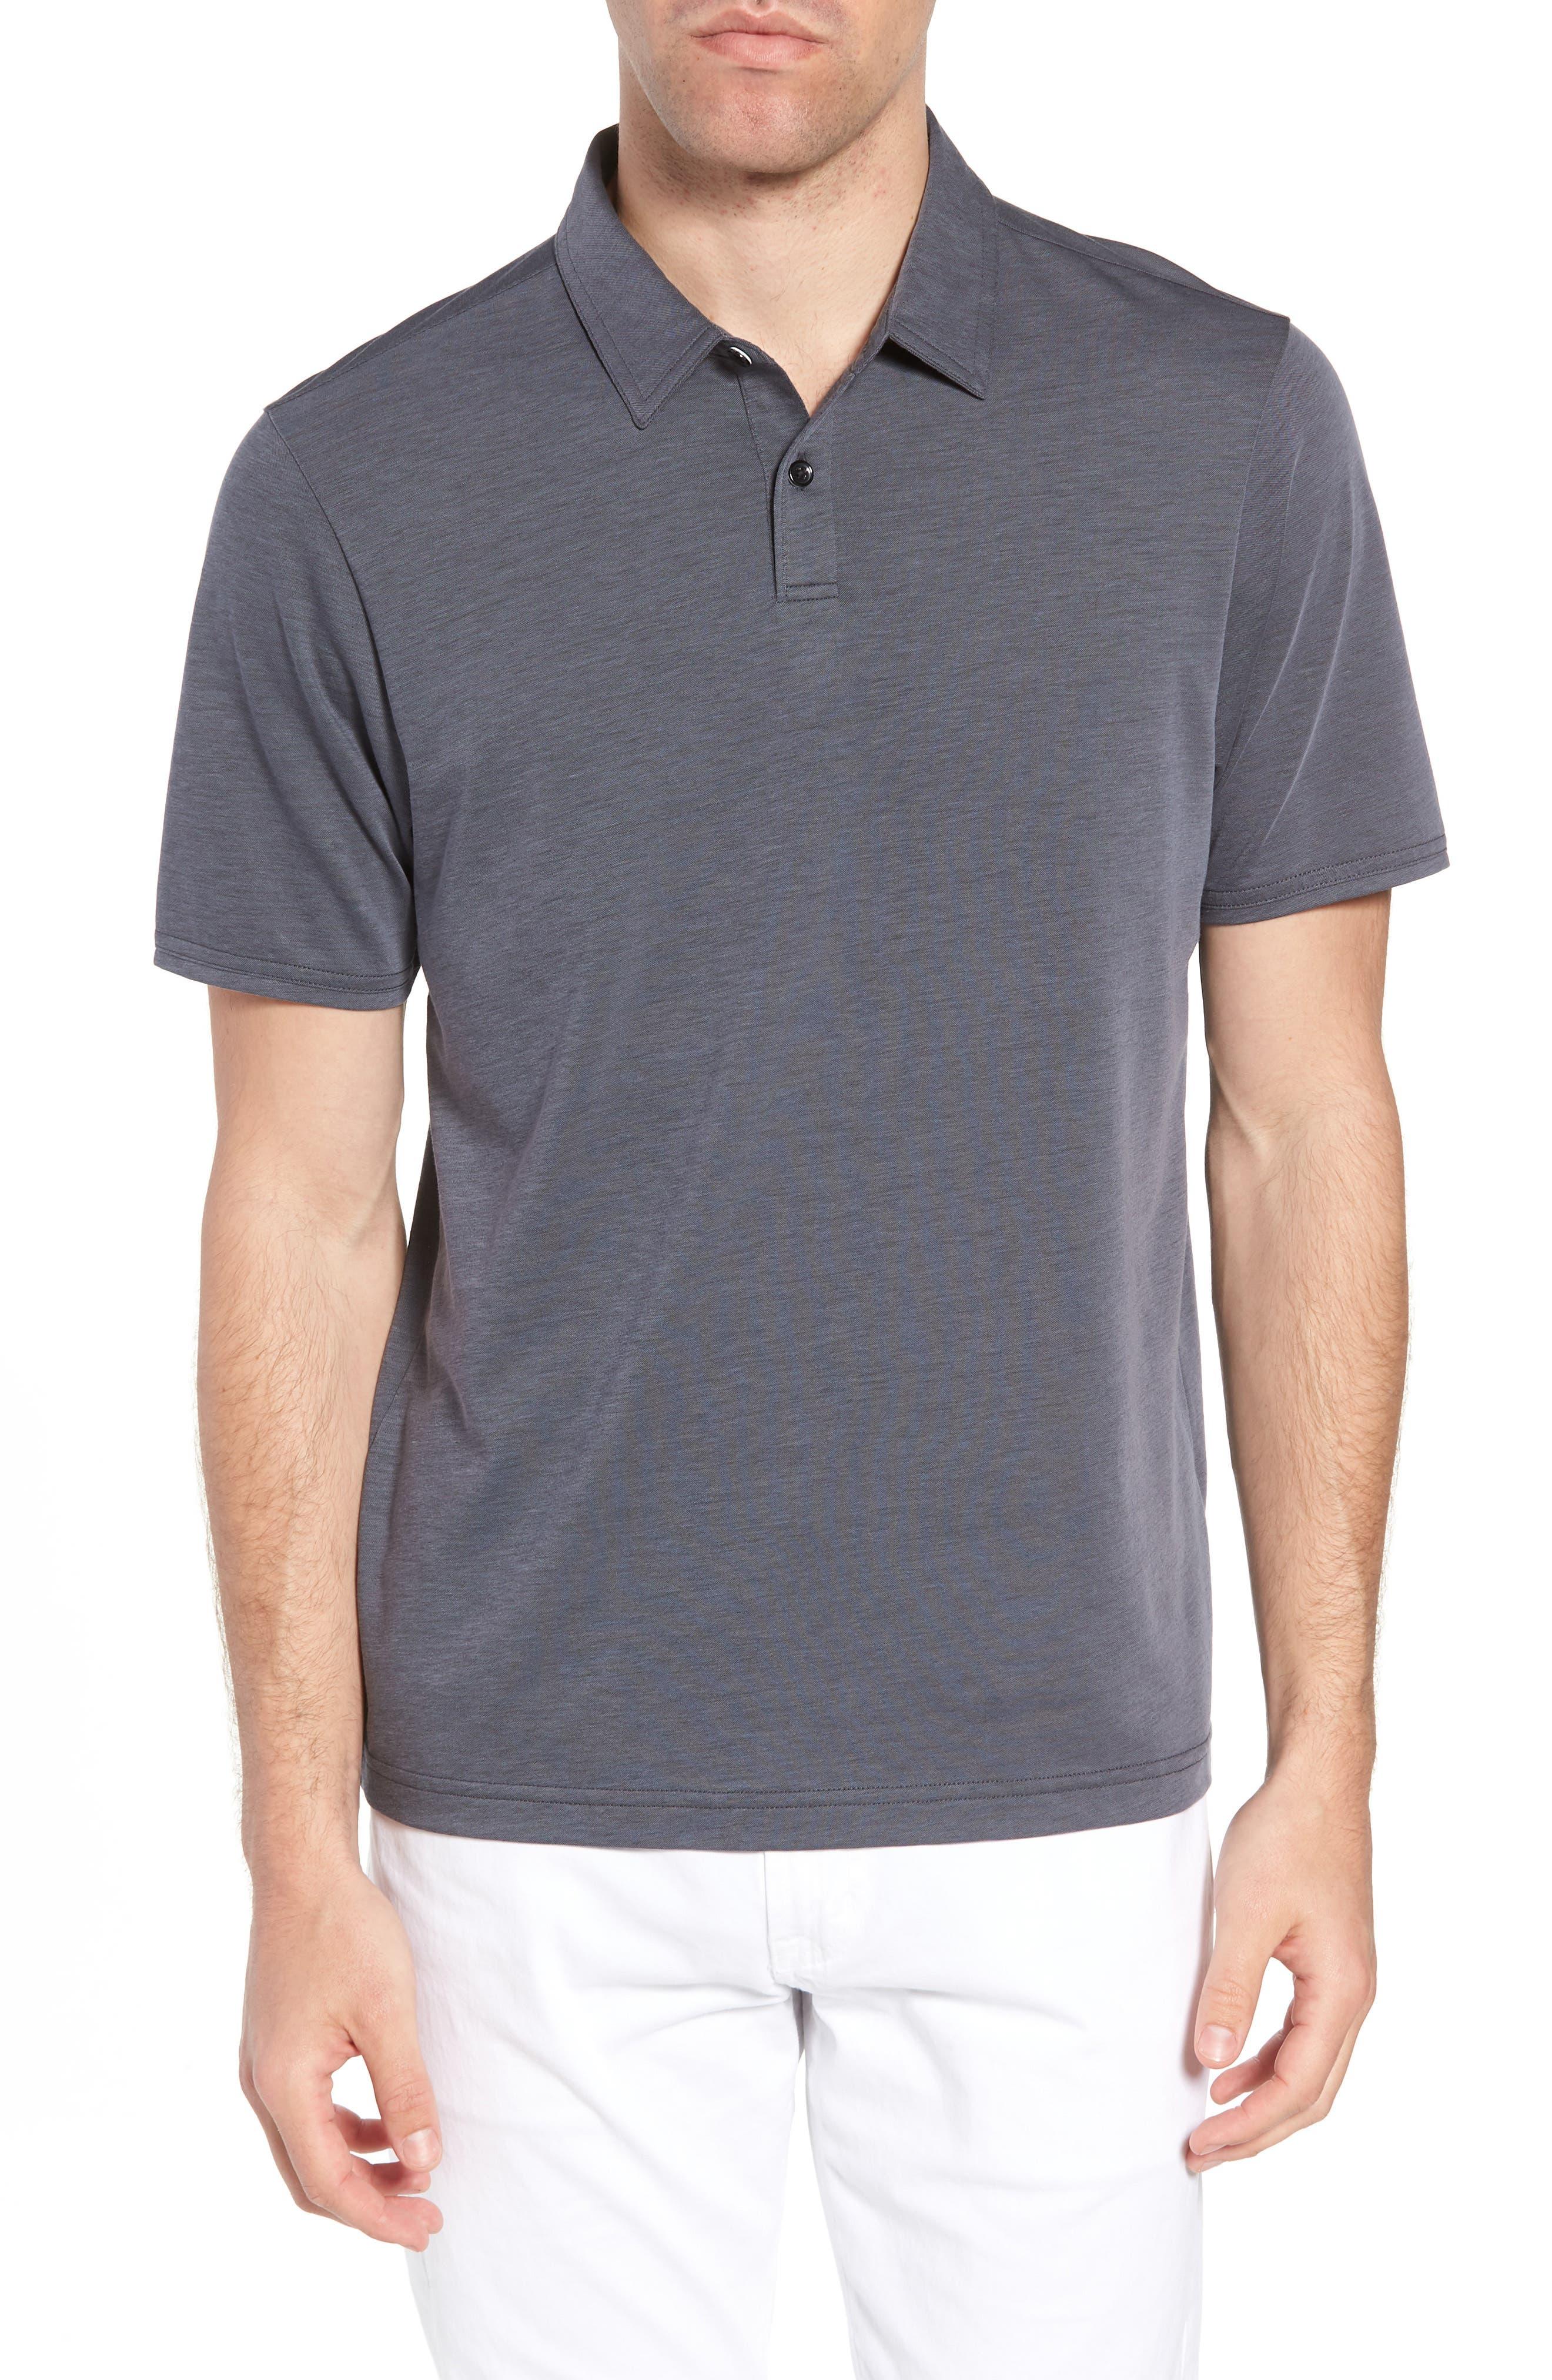 Shalene Regular Fit Polo,                             Main thumbnail 1, color,                             Grisaille/ Black